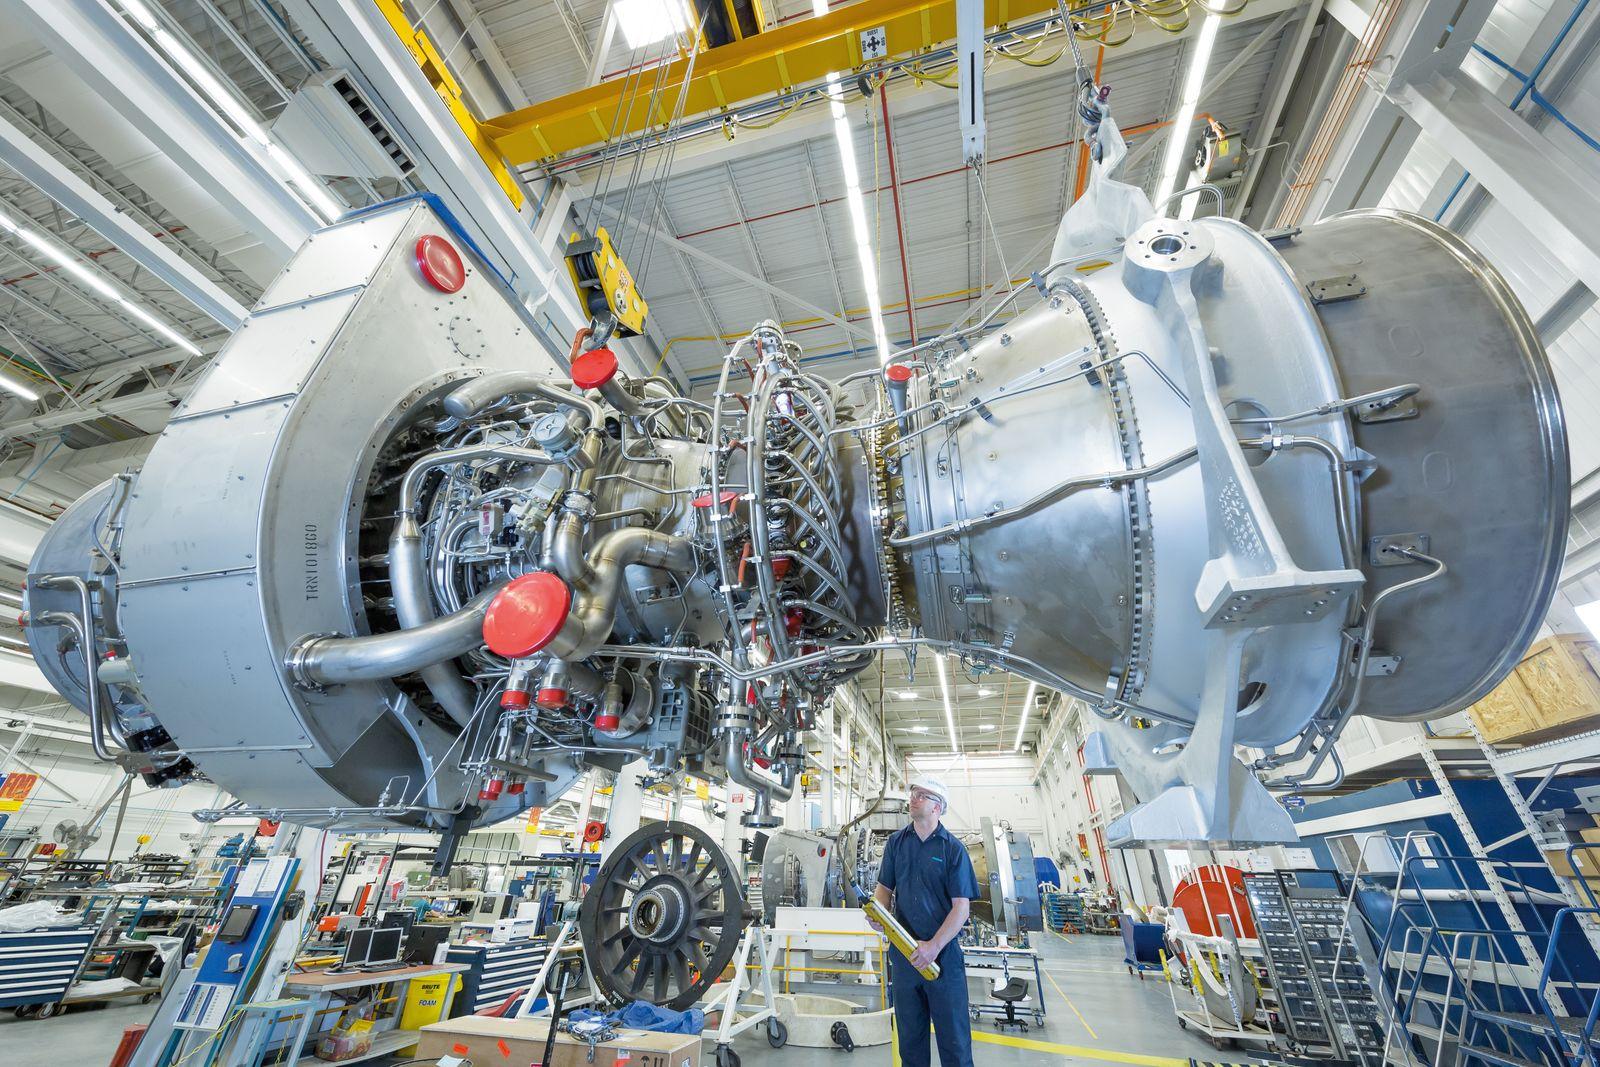 Siemens Industrial Trent 60 Gasturbine / Siemens Industrial Trent 60 gas turbine